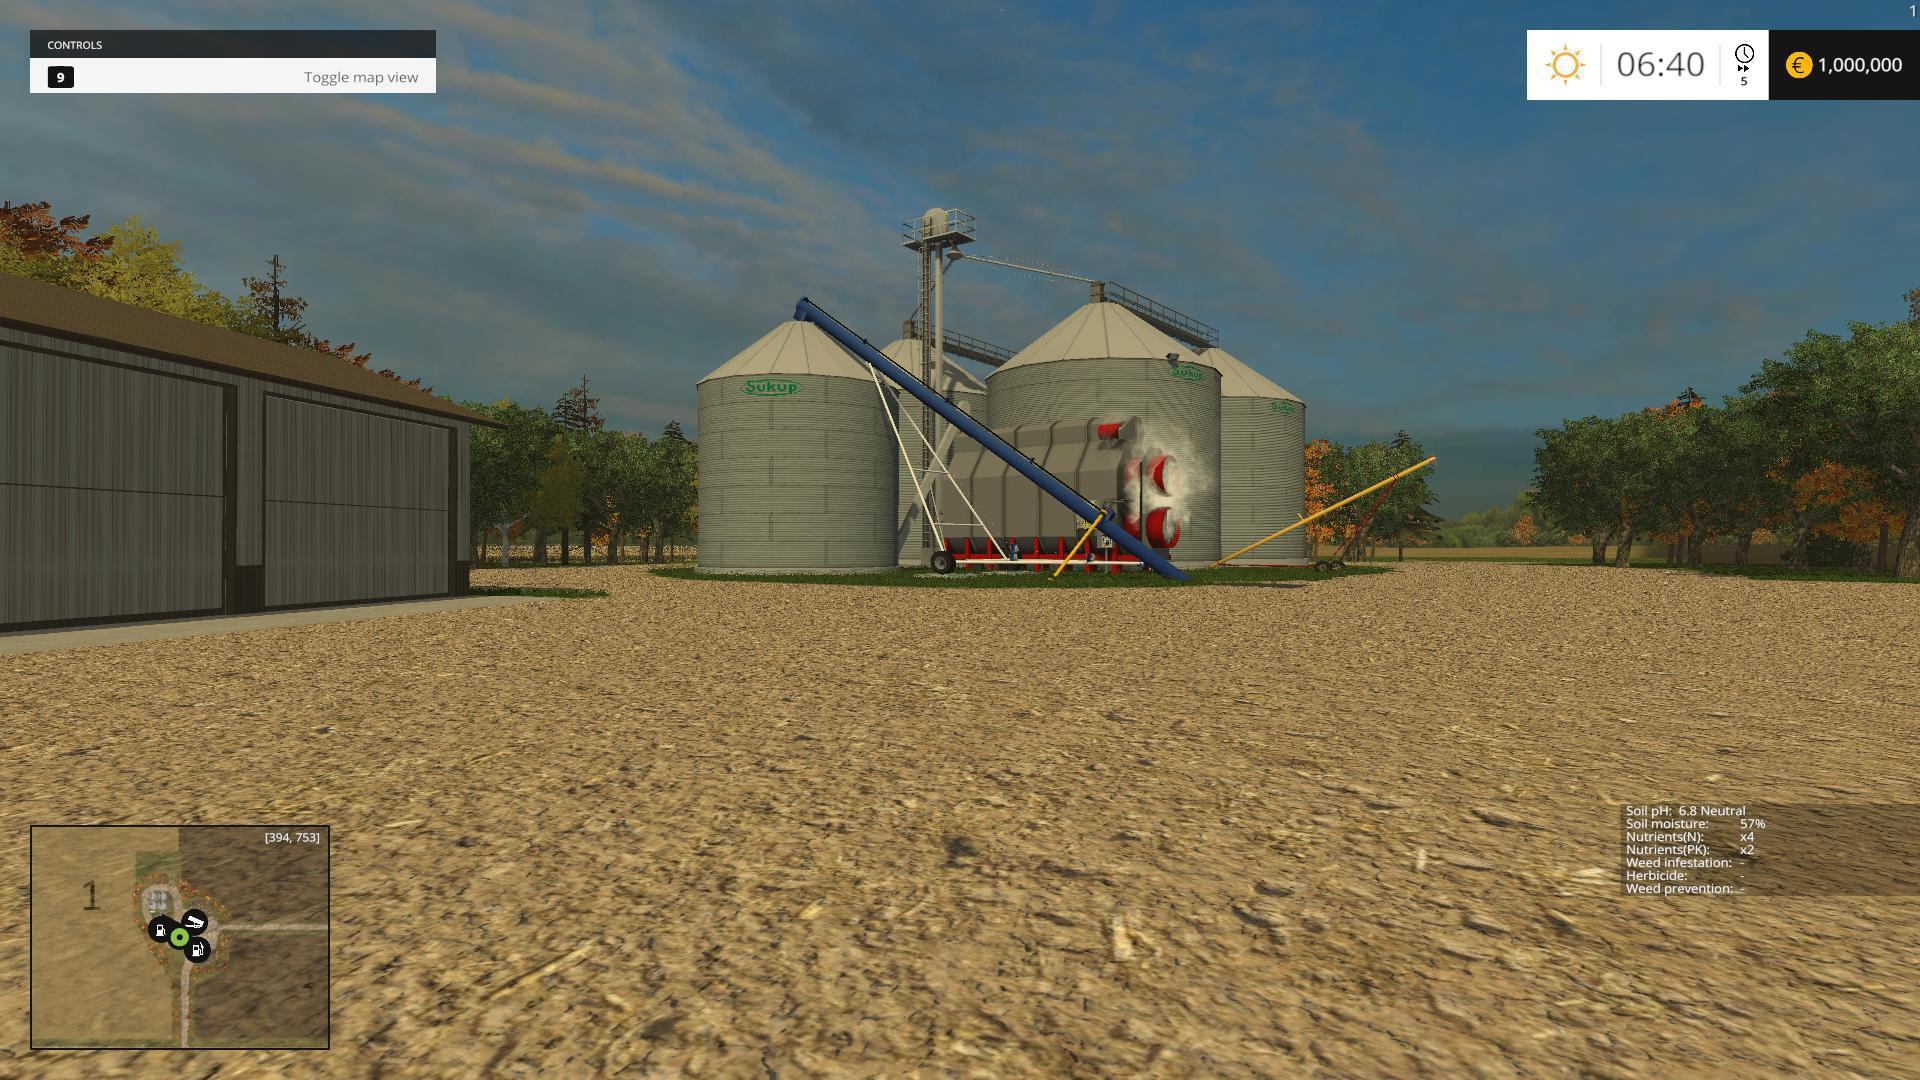 SMALL TOWN AMERICA MAP V20 Farming simulator 2019 2017 2015 Mod